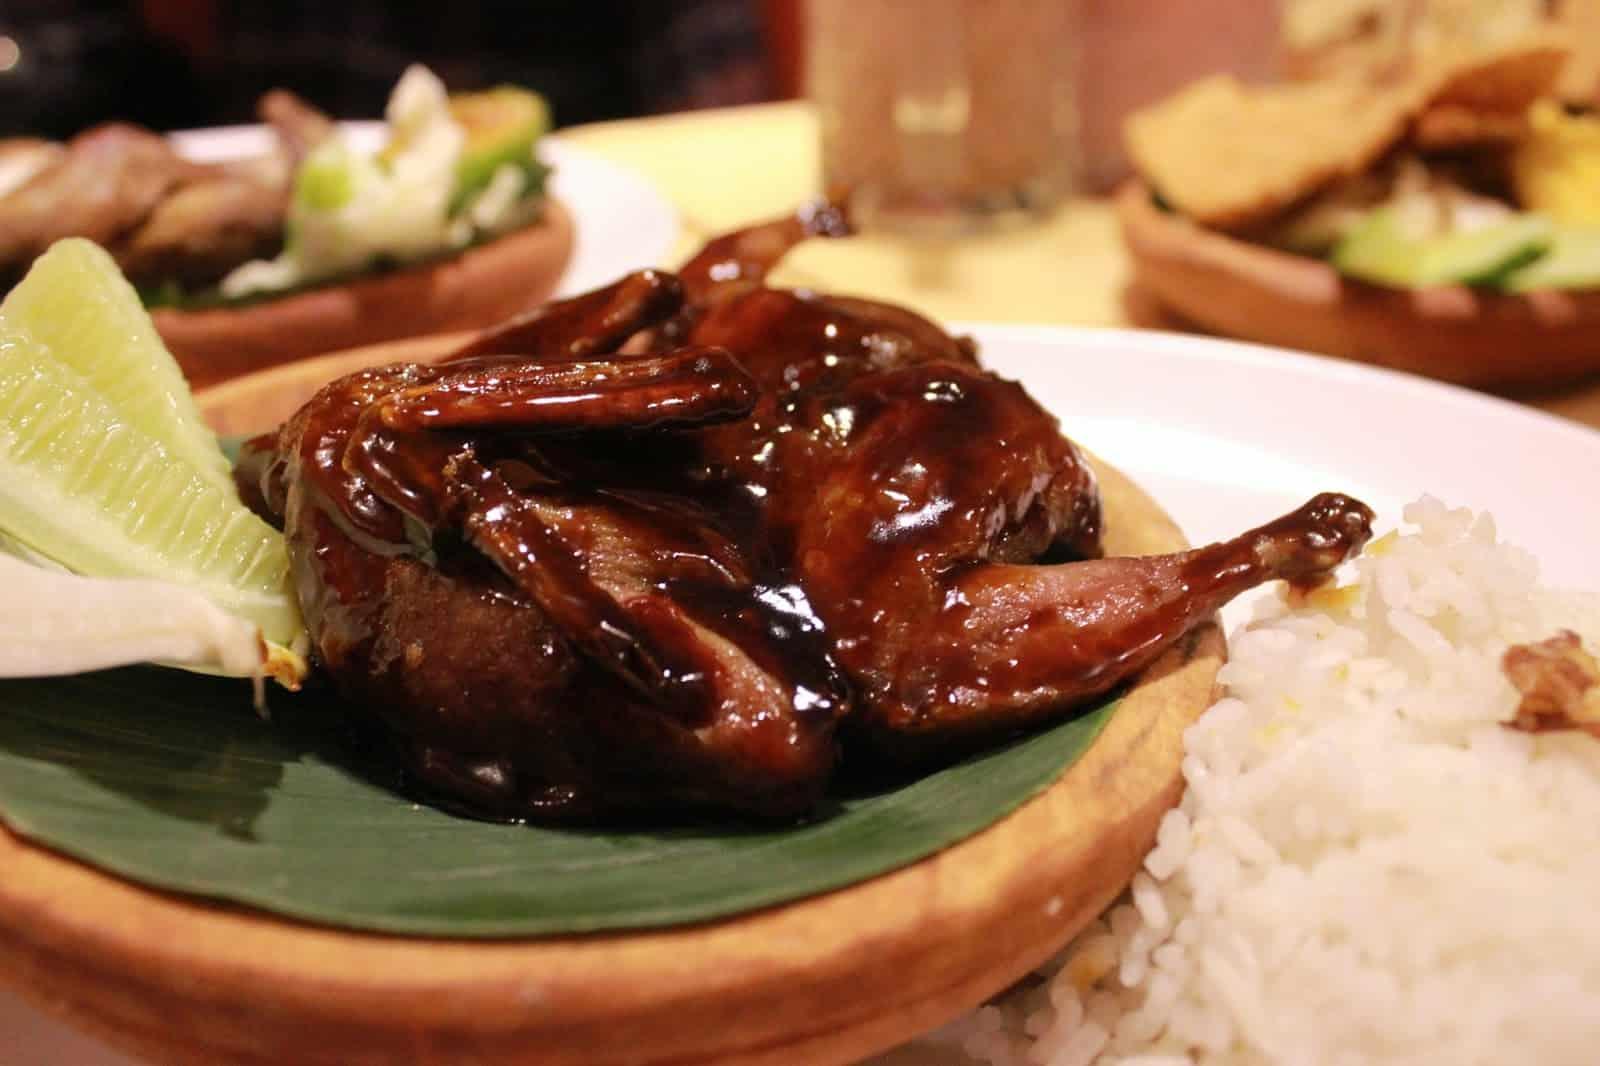 gambar makanan khas kalimantan barat Burung Punai